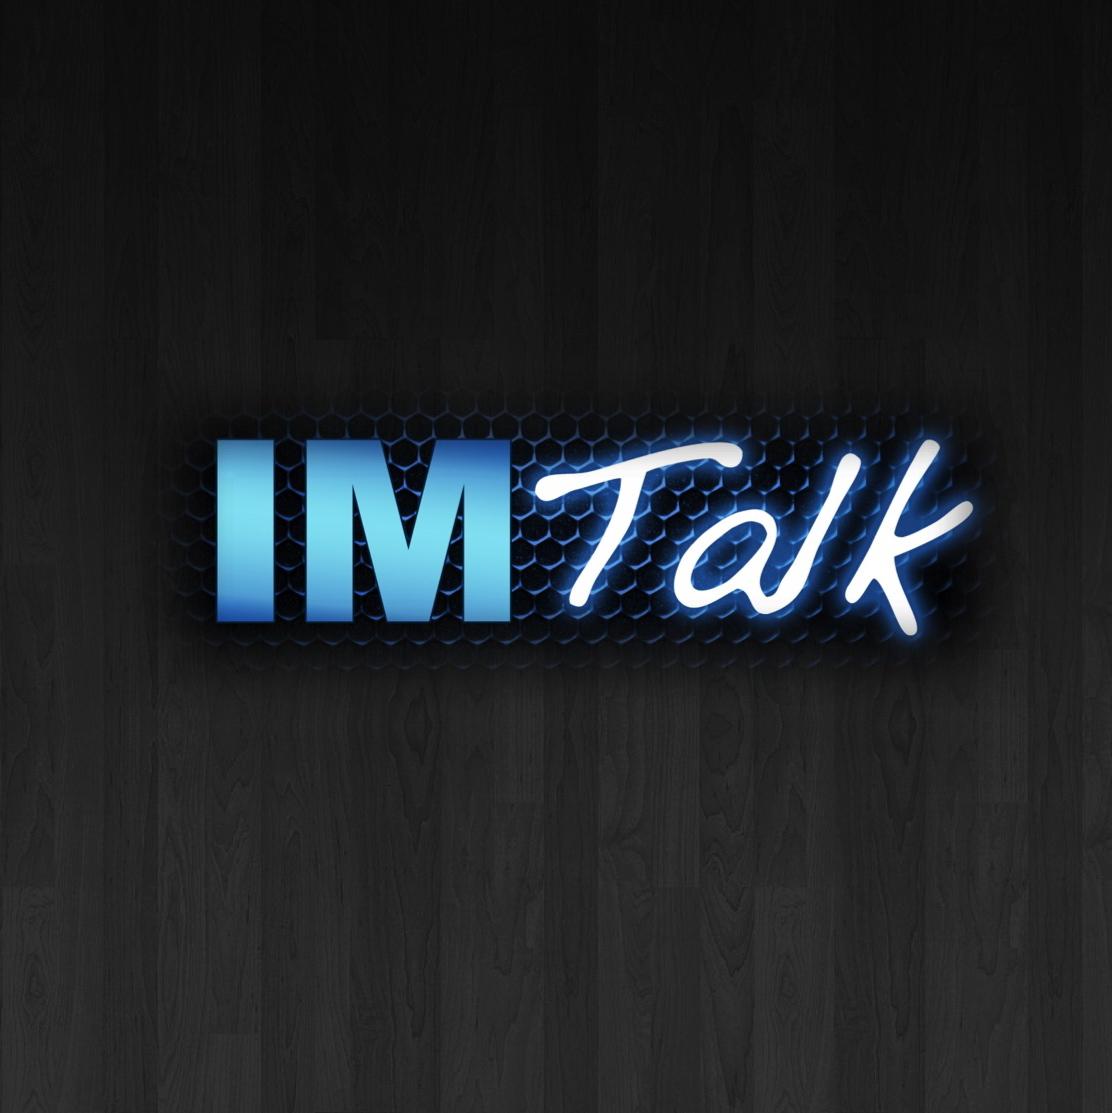 IMTalk Episode 742 - Epic Camp NZ interviews show art